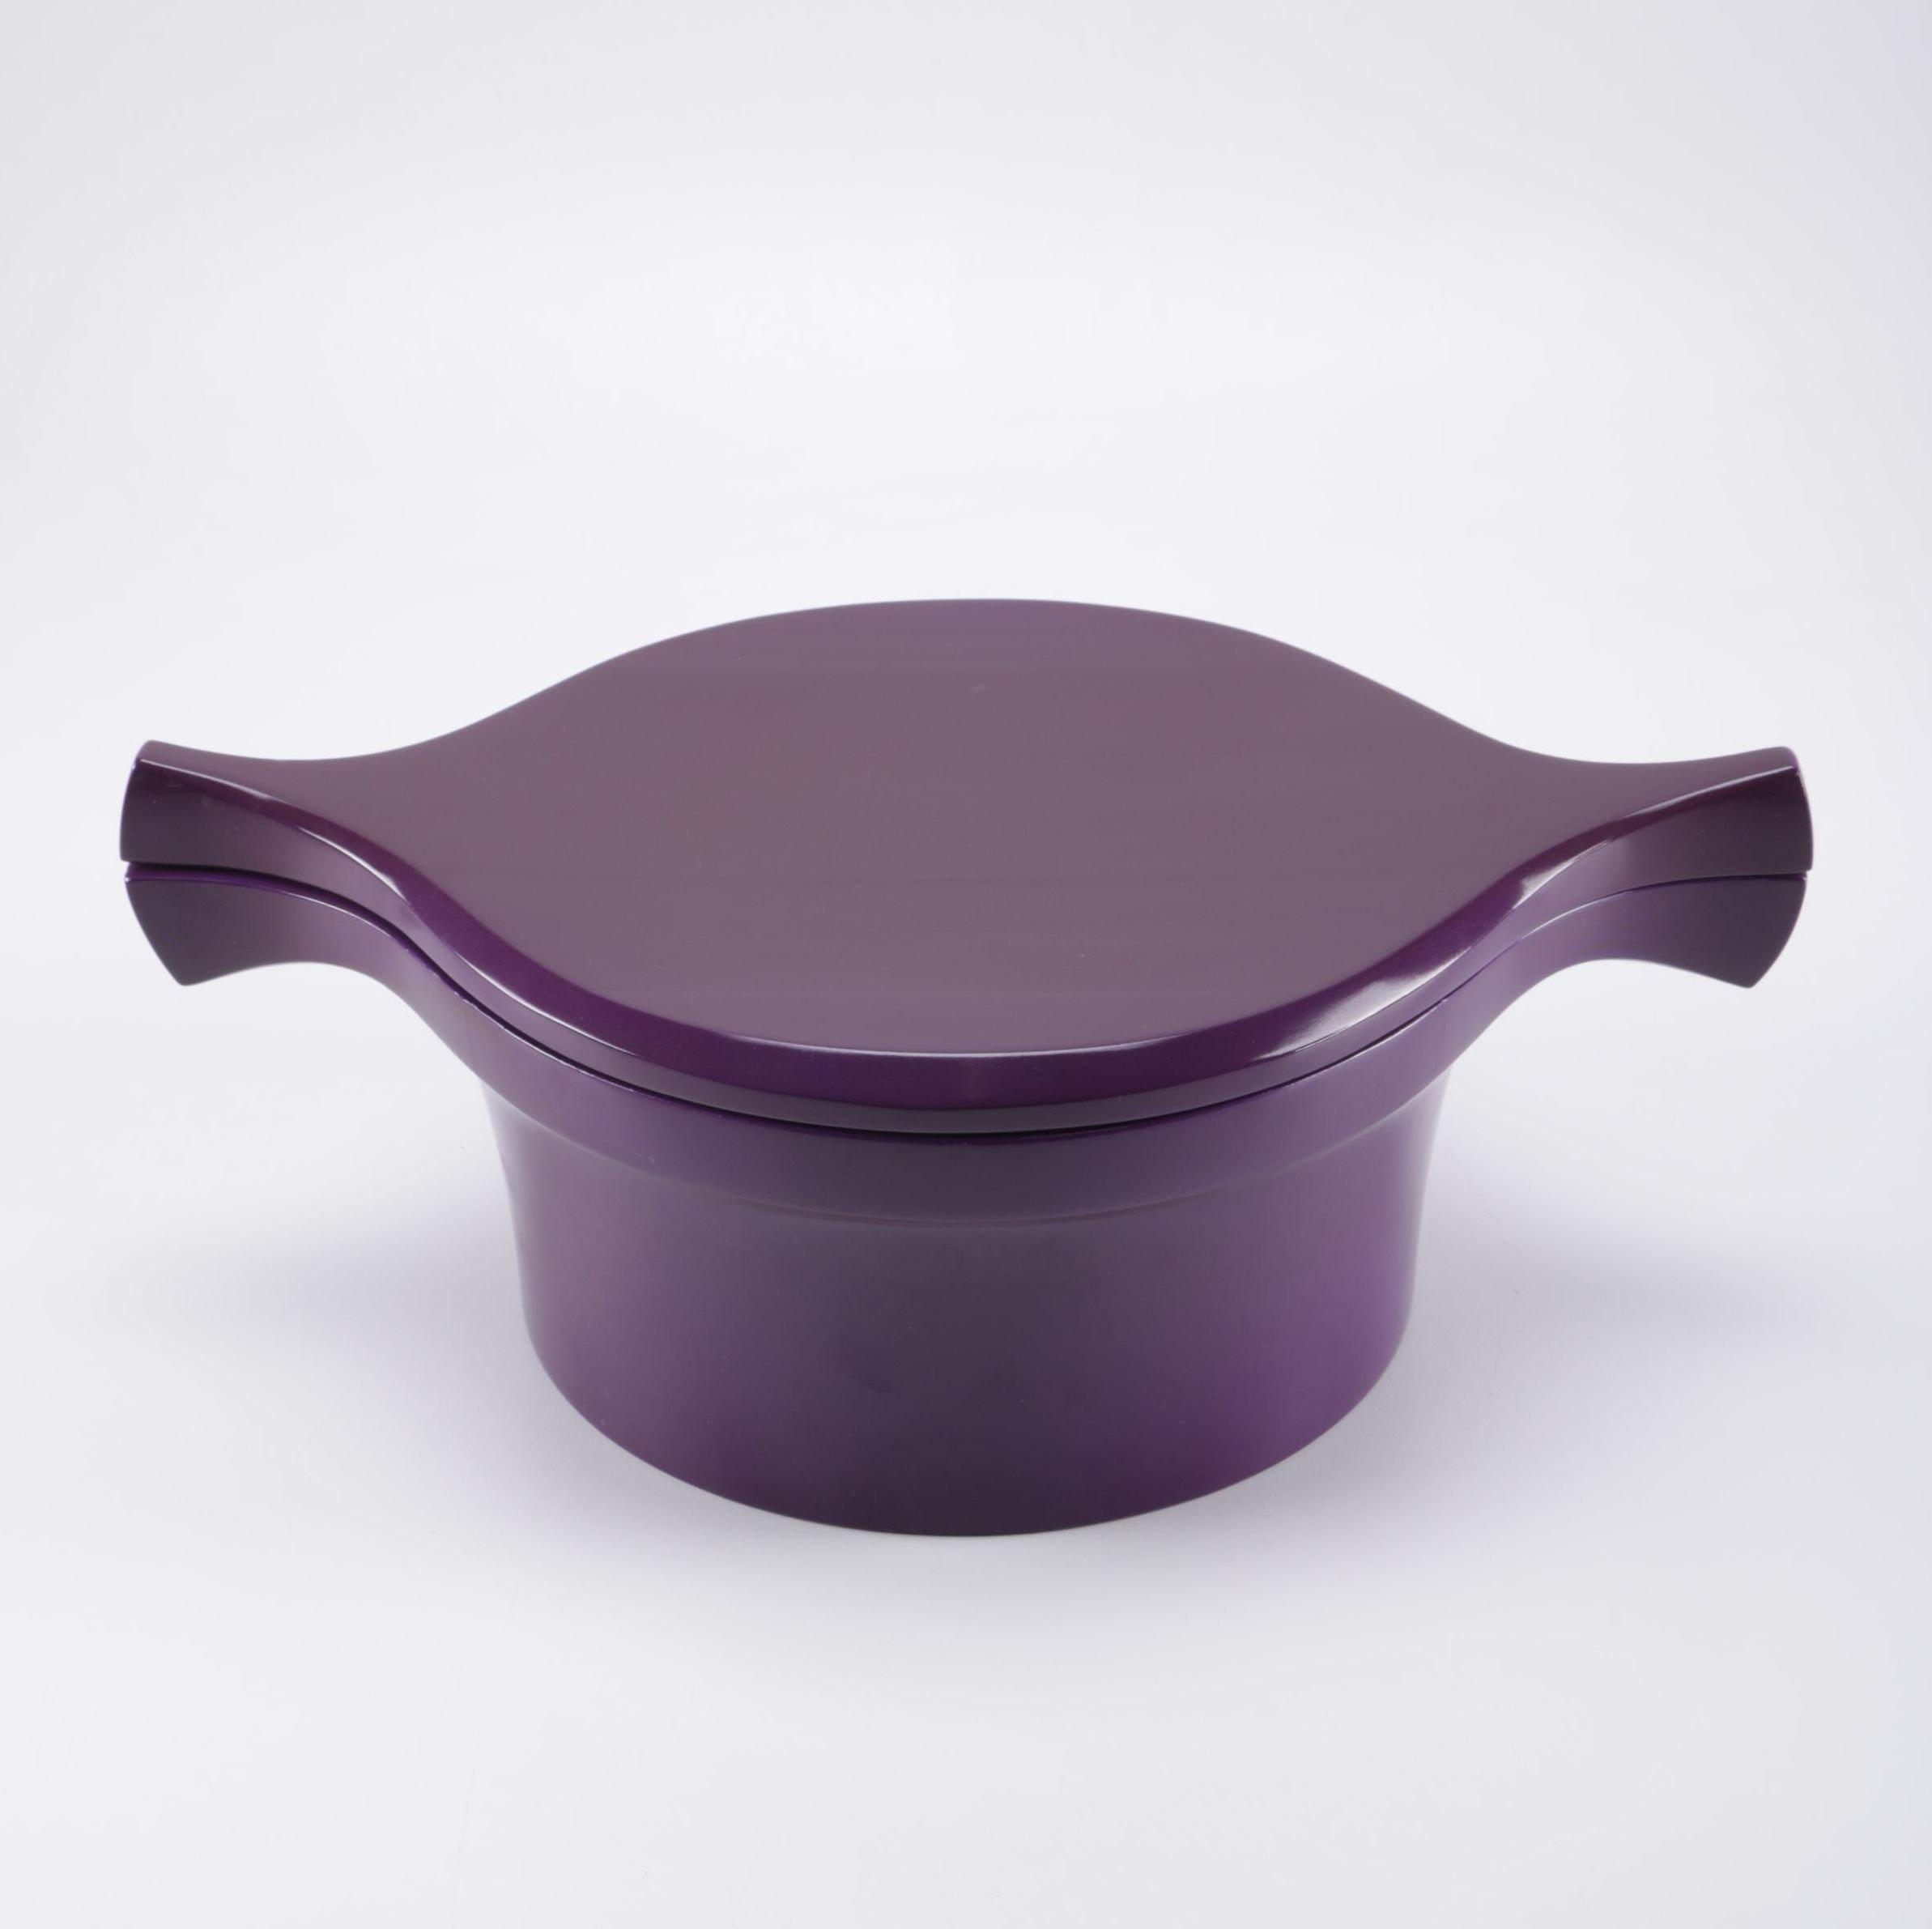 Dansk Purple Wooden Serving Bowl With Lid